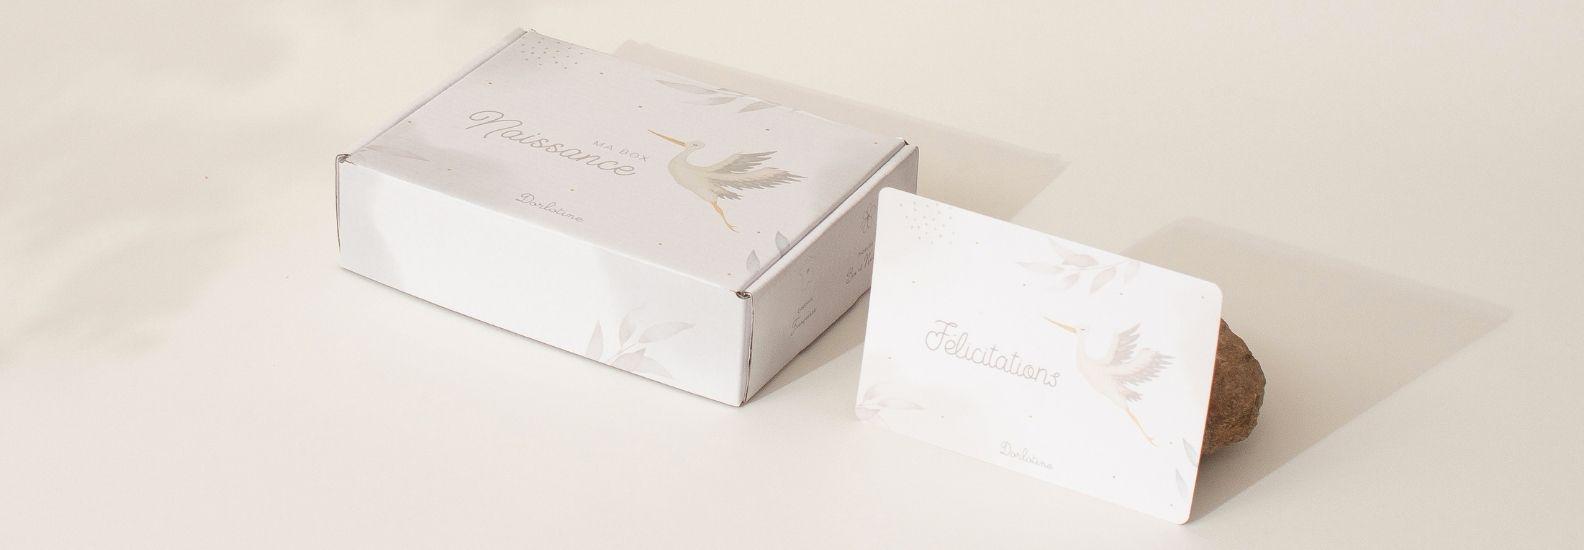 box-NAISSANCE-personnalisable-dorlotine